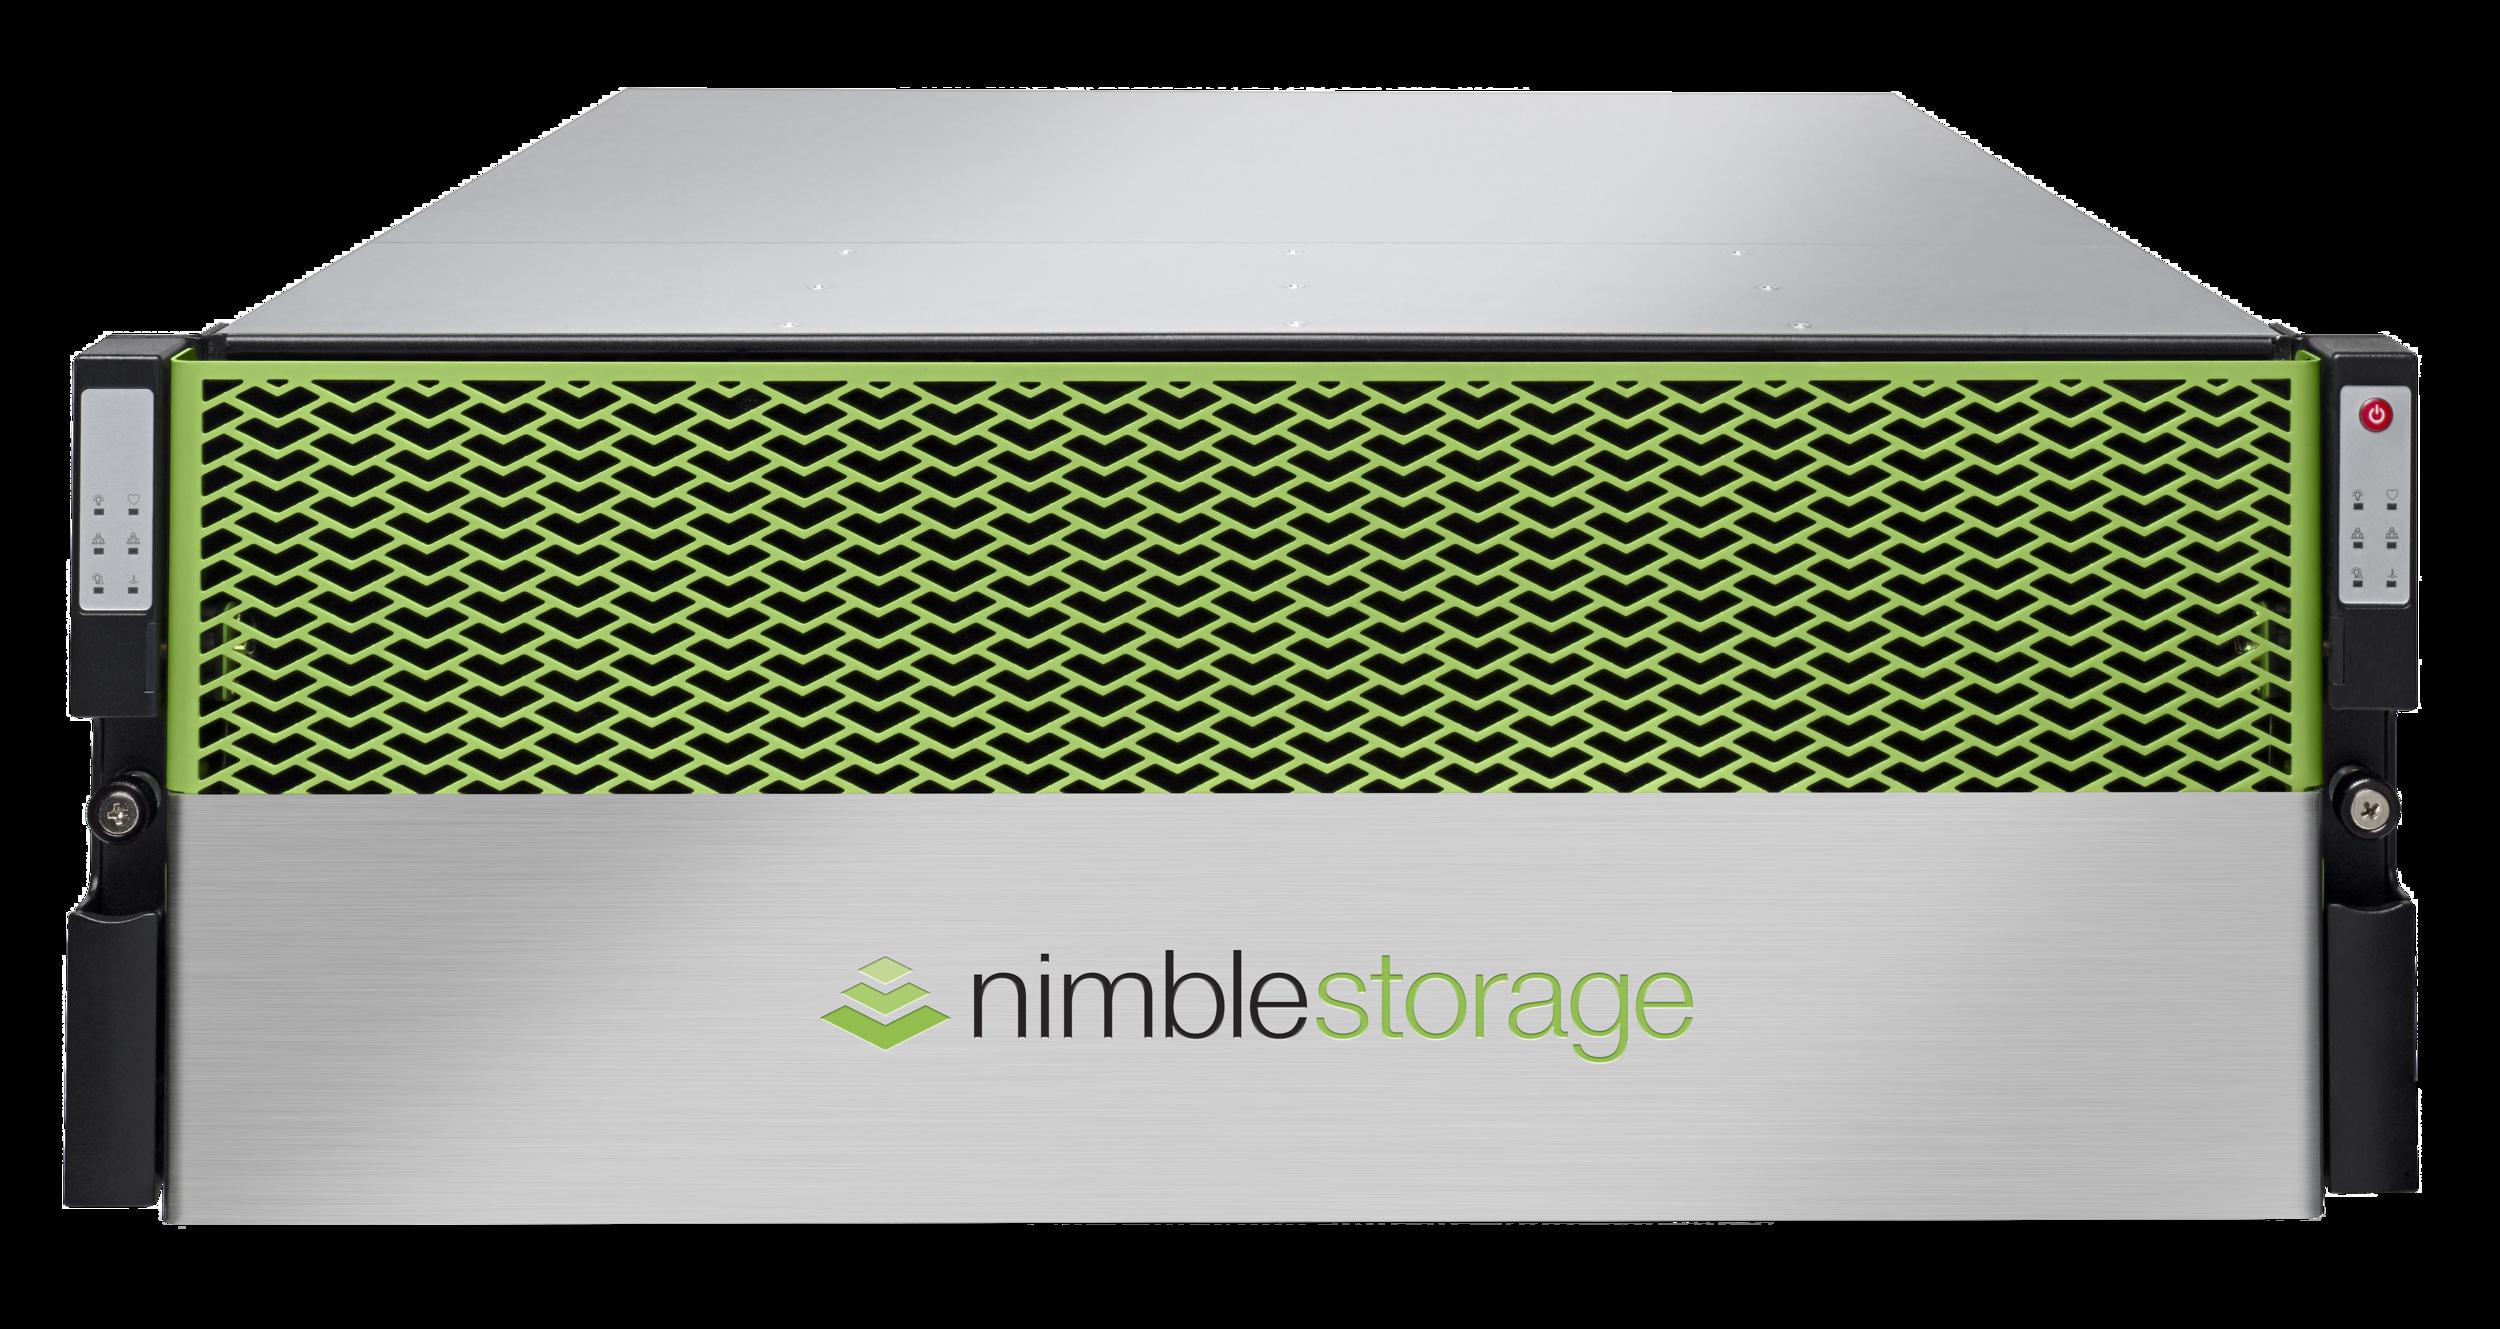 NimbleStorage_FT transparent.png